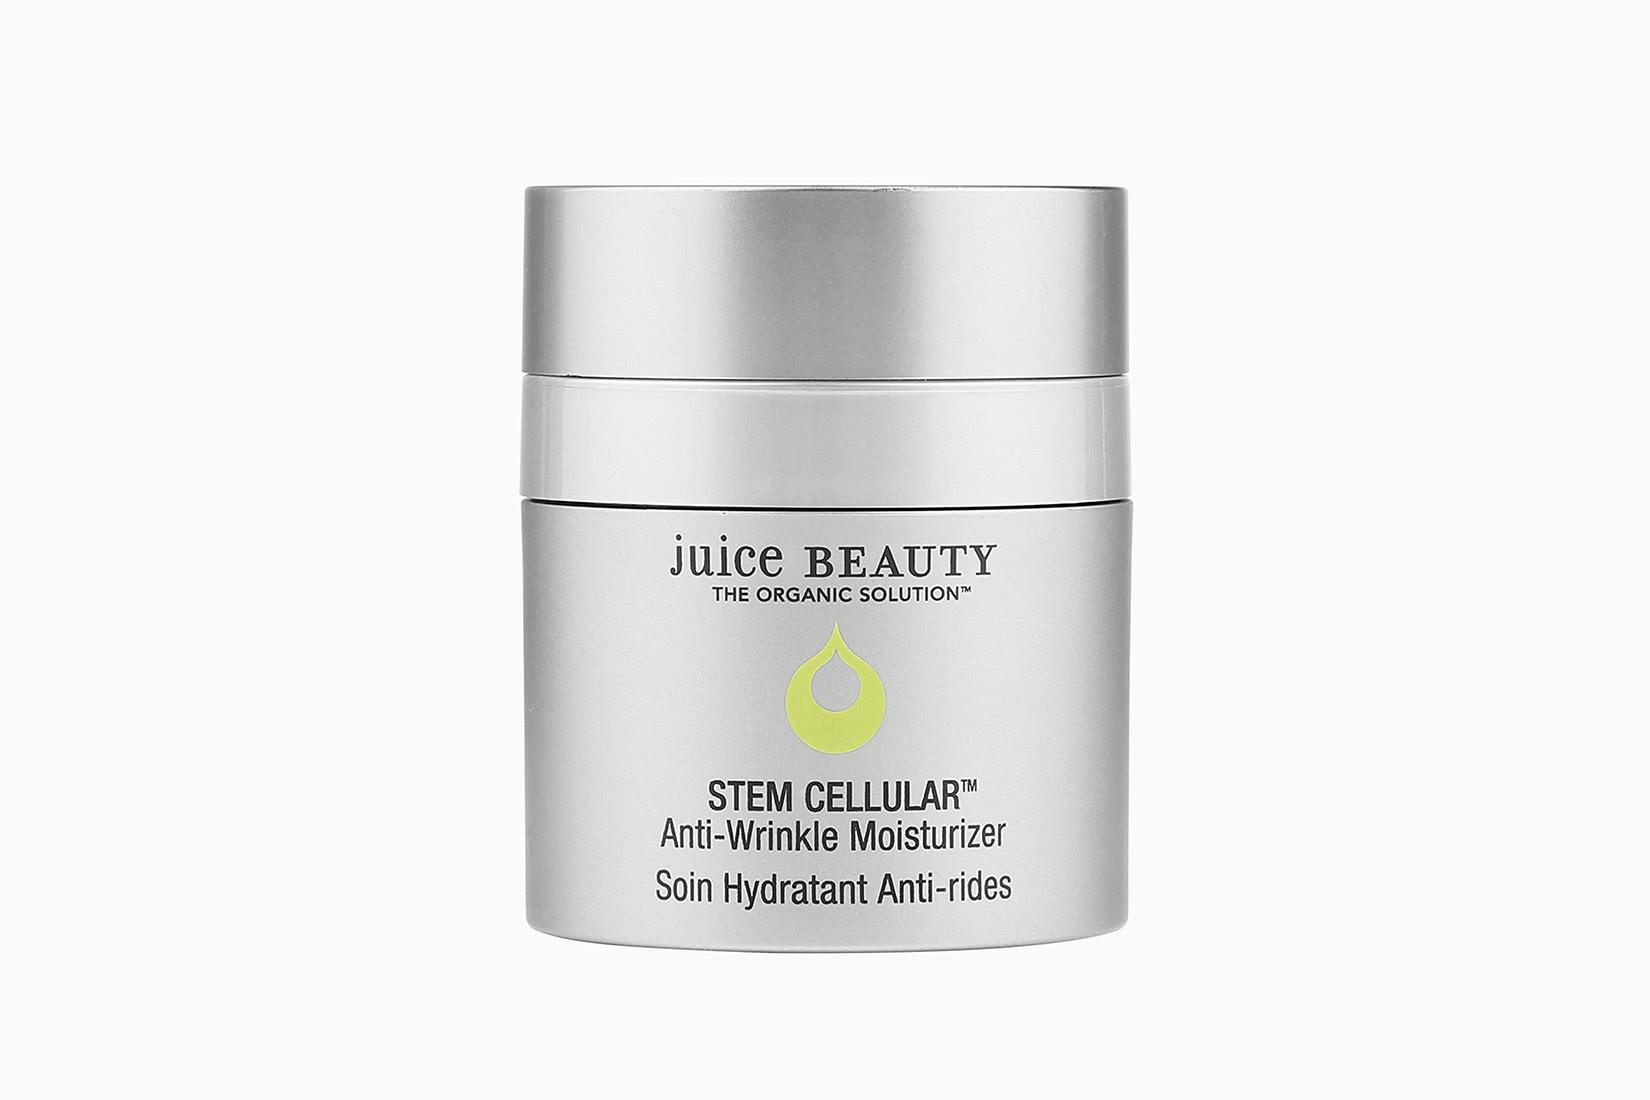 best natural organic beauty skincare juice beauty anti-wrinkle moisturiser - Luxe Digital